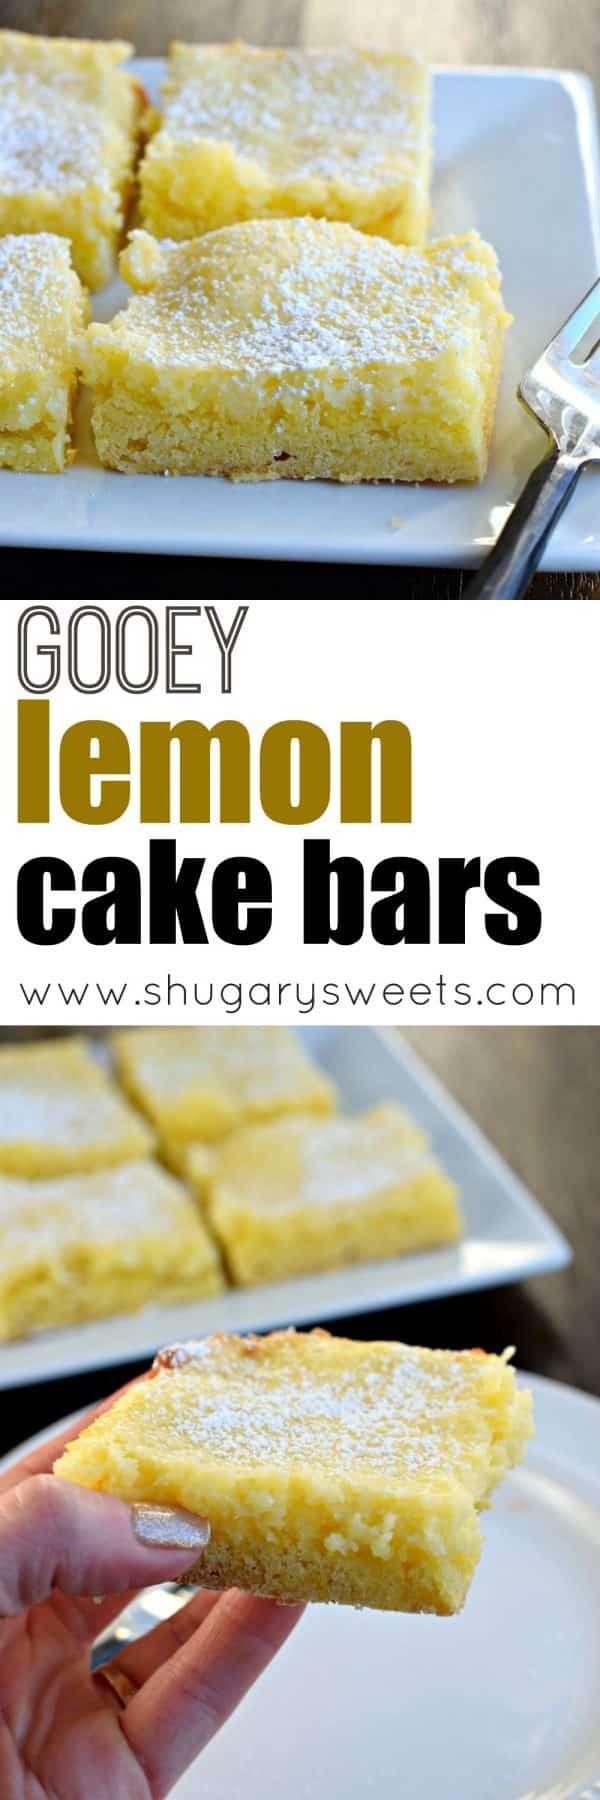 Gooey Lemon Cake Bar photo collage